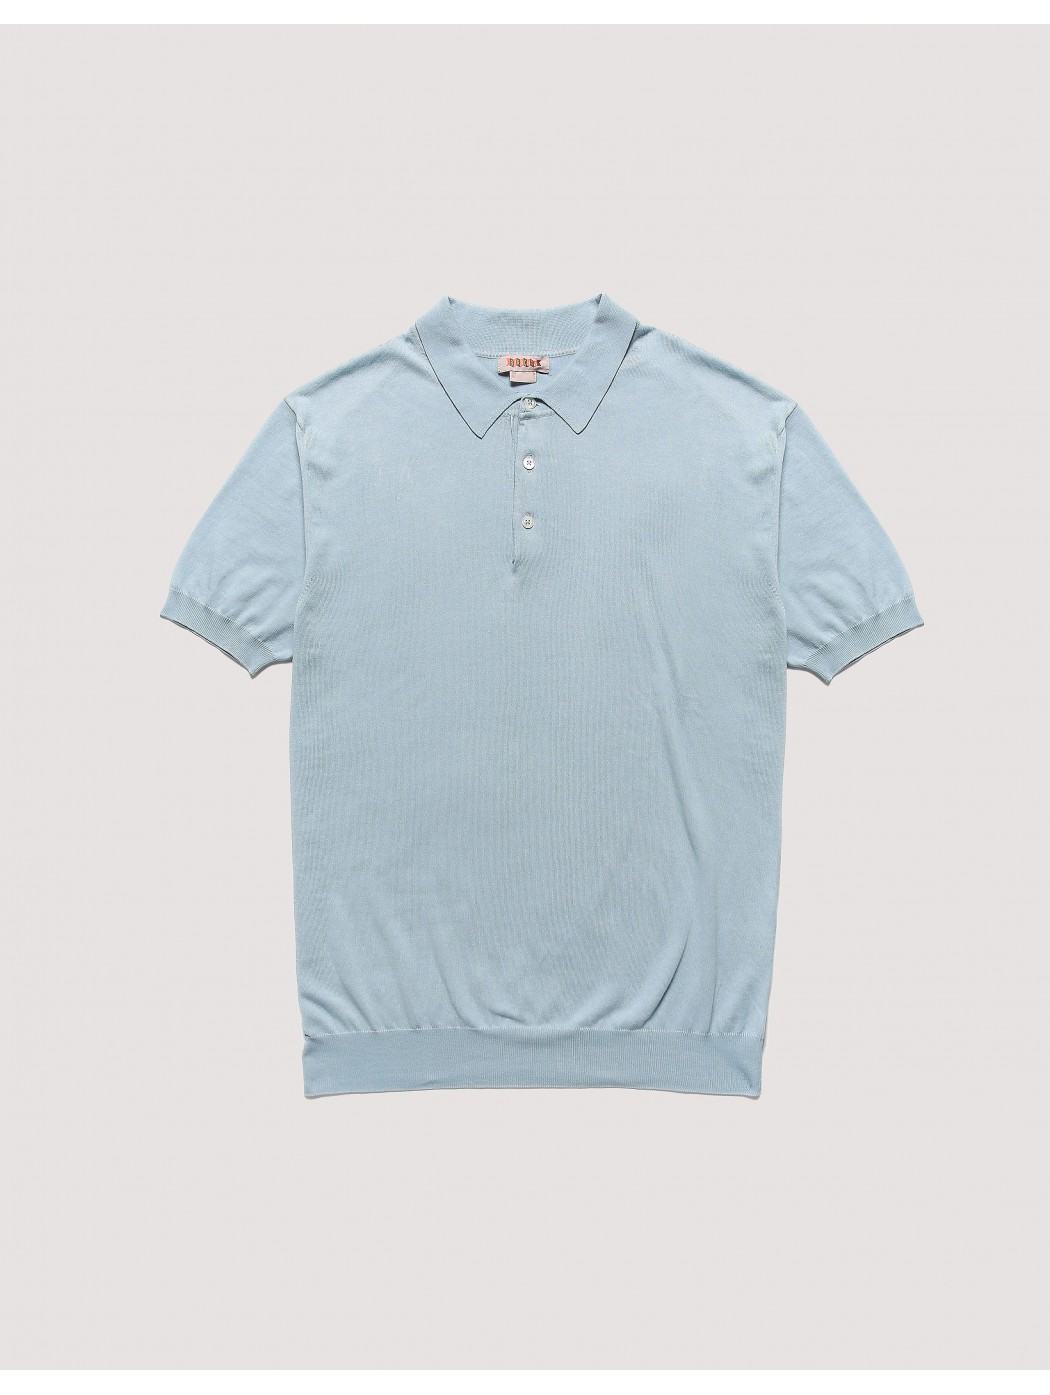 Ss Polo Knit Nuvola BARACUTA BRMAG0003BKNT1 349